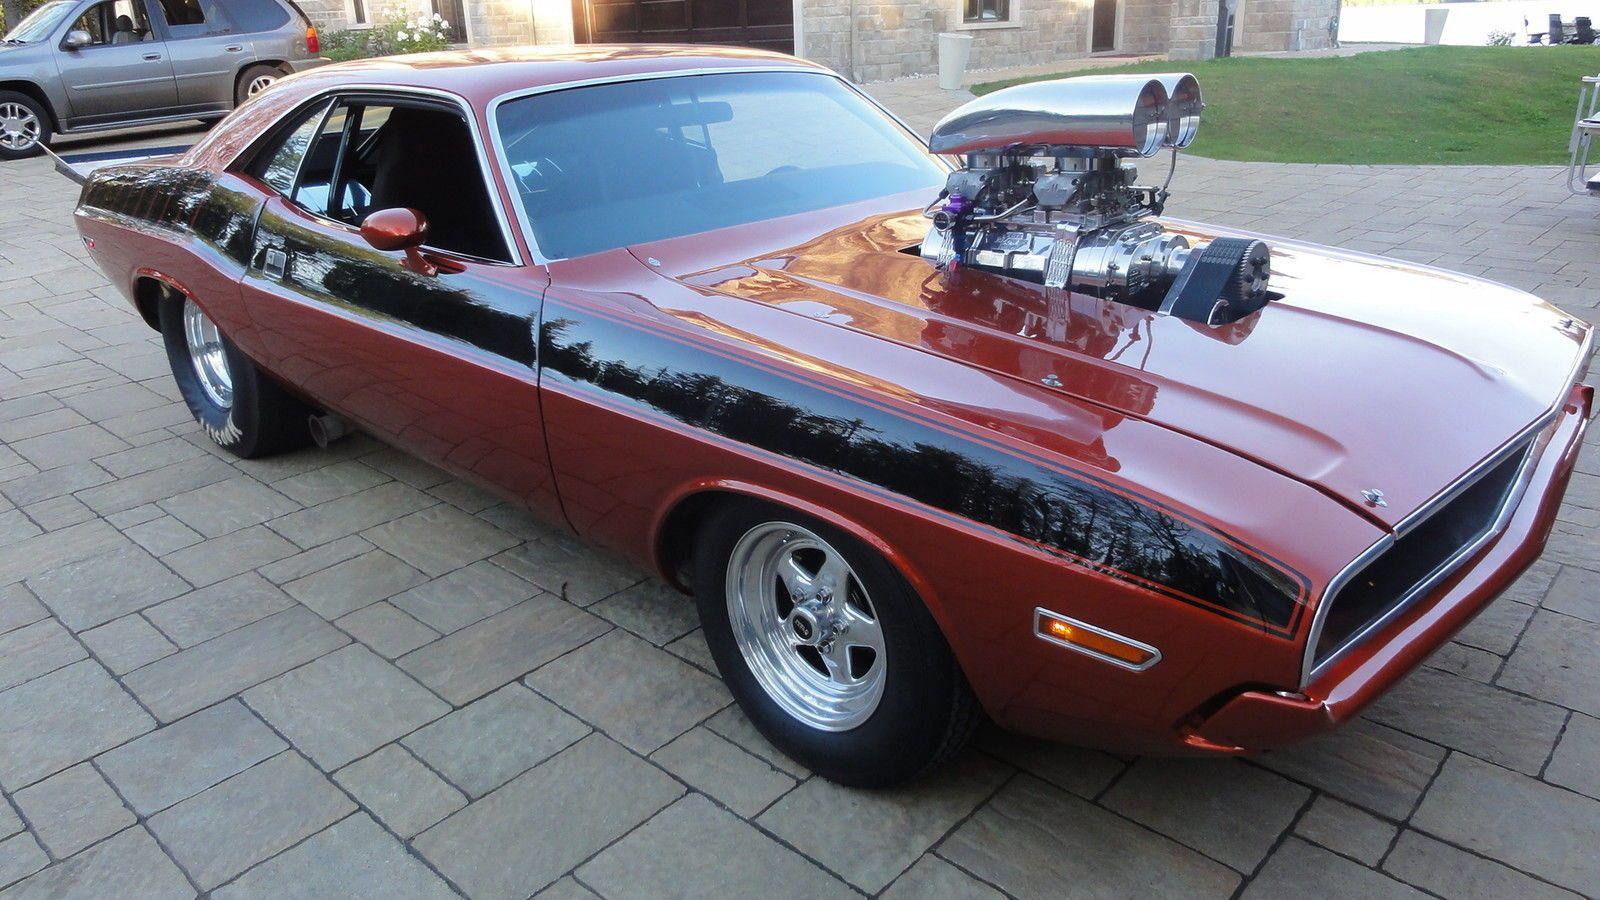 1970 dodge challenger r t 8 71 blown 490ci 1200hp keith black